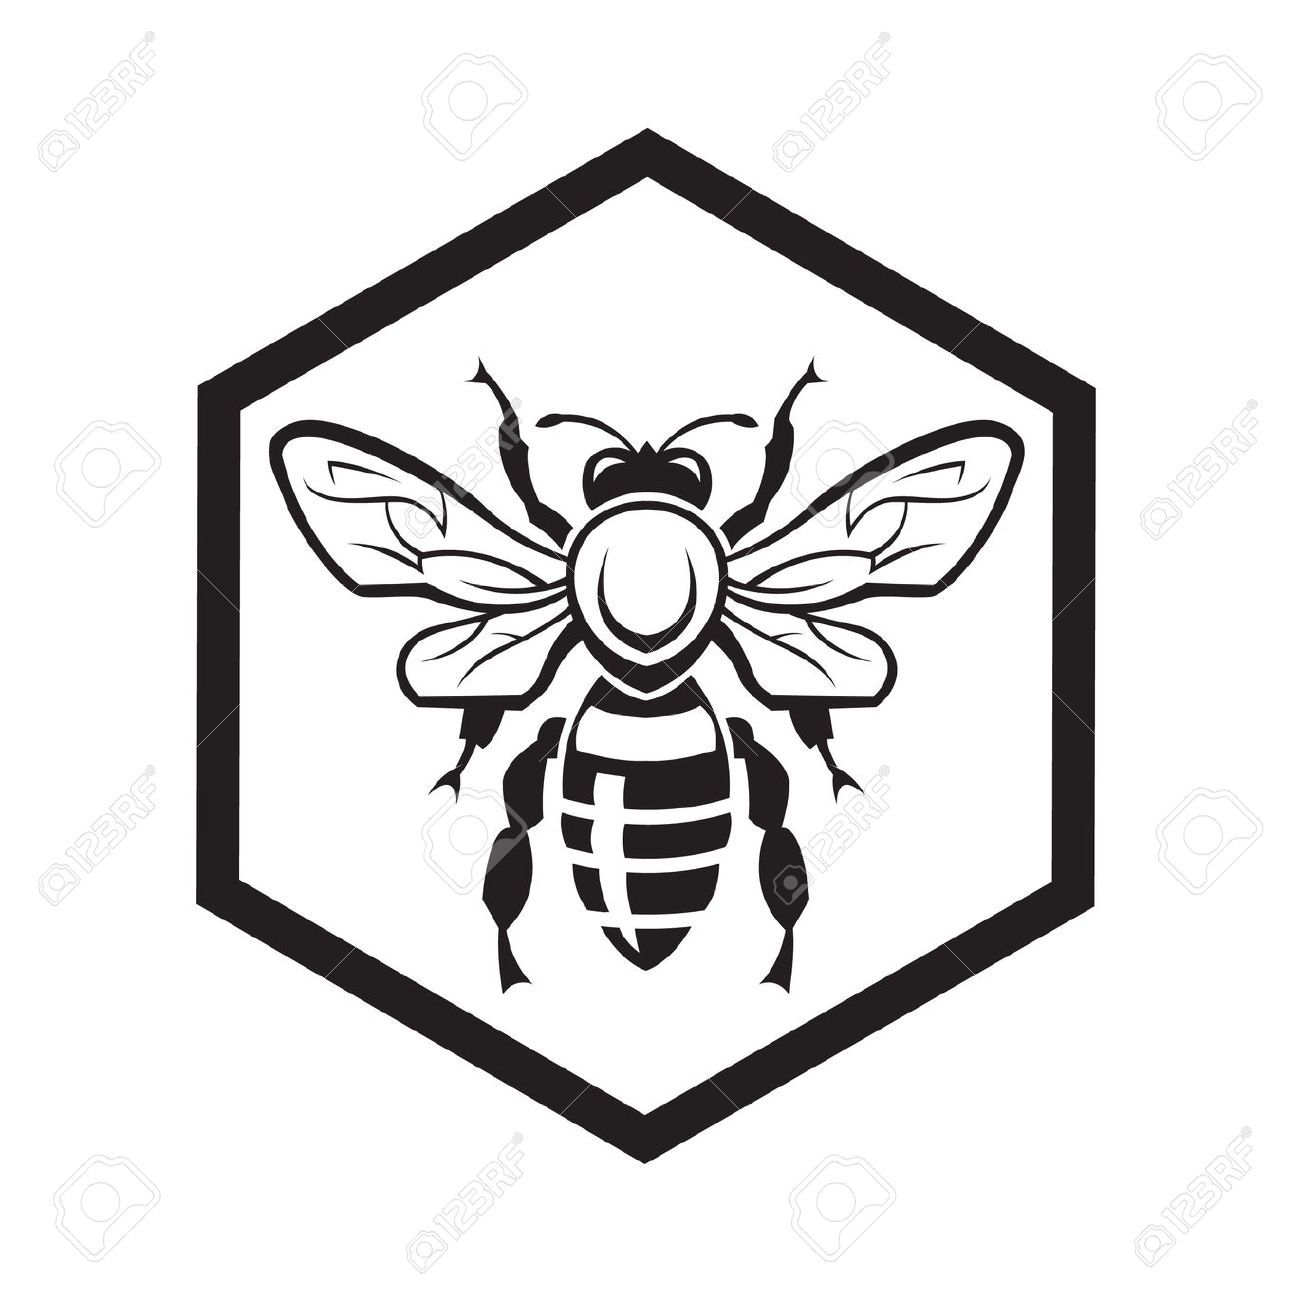 Honeycomb Bee Drawing